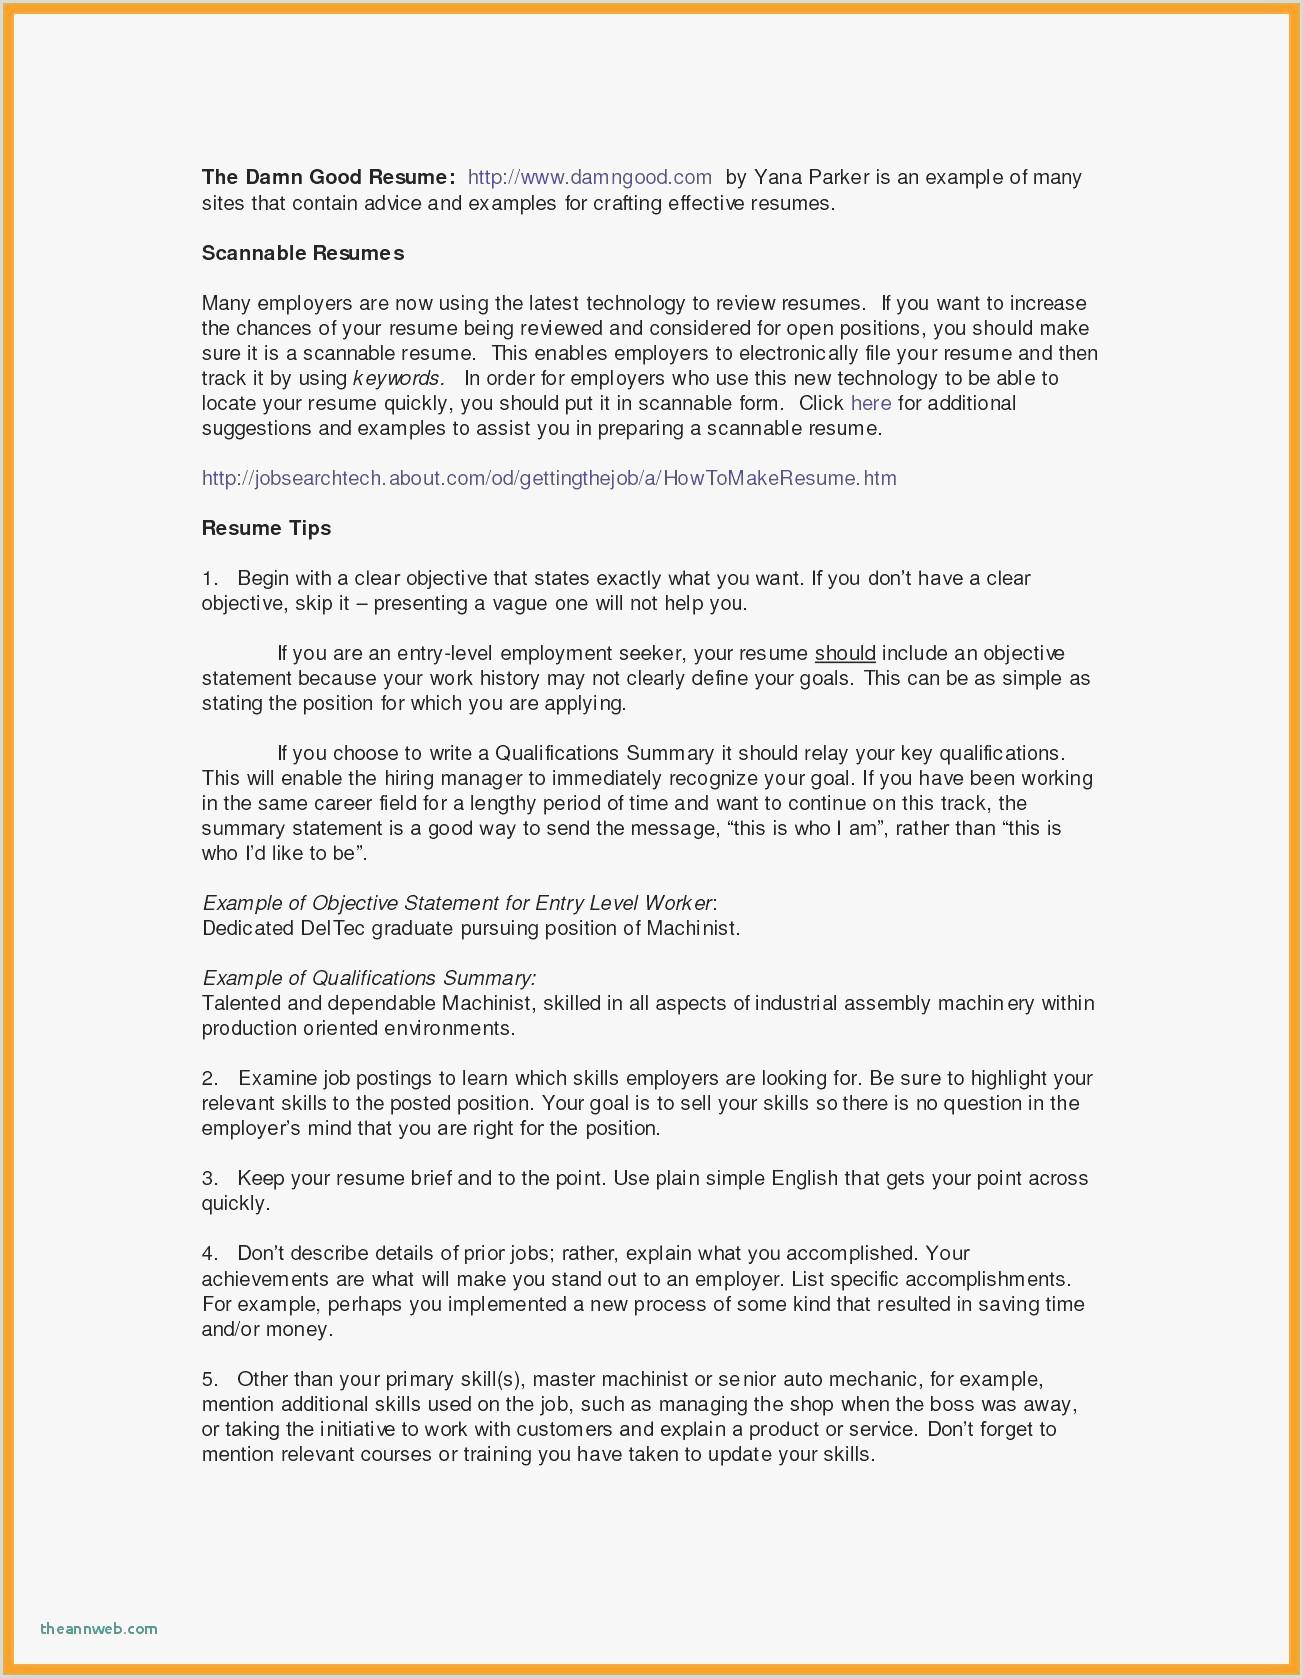 Real Estate Agent Job Description 11 Real Estate Agent Job Description for Resume Examples